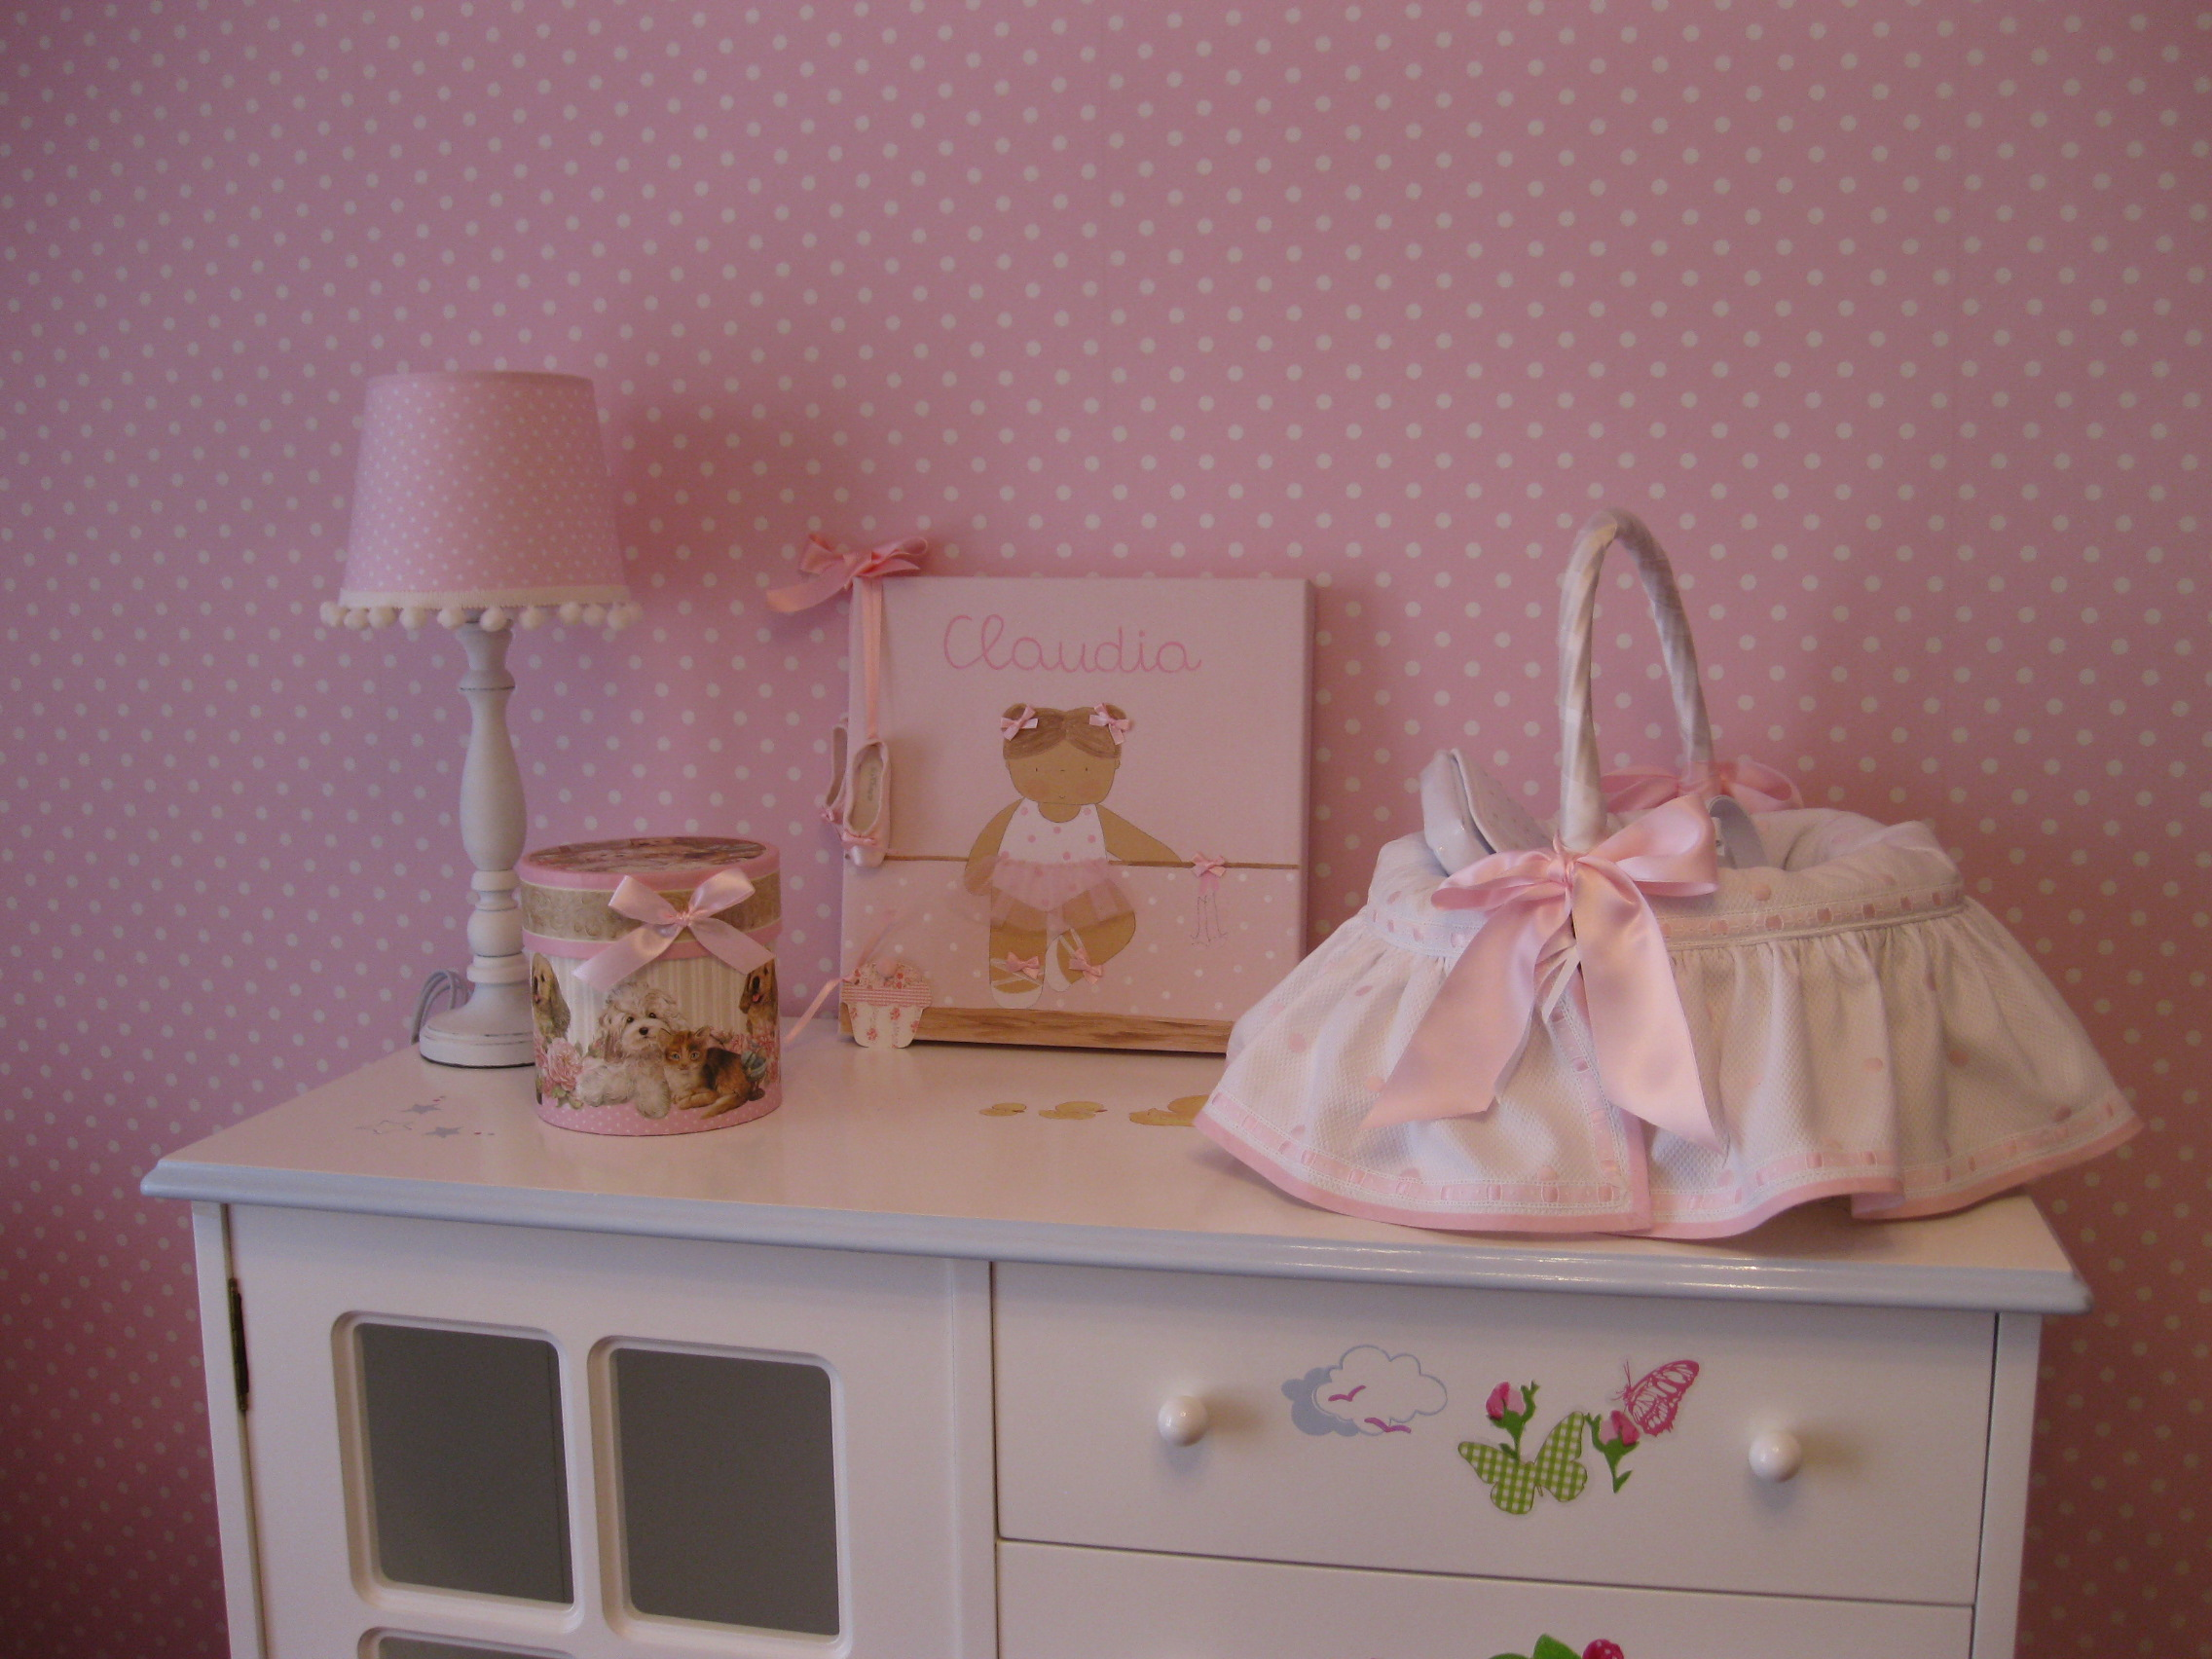 La preciosa habitaci n de claudia villalba interiorismo - Habitacion infantil rosa ...